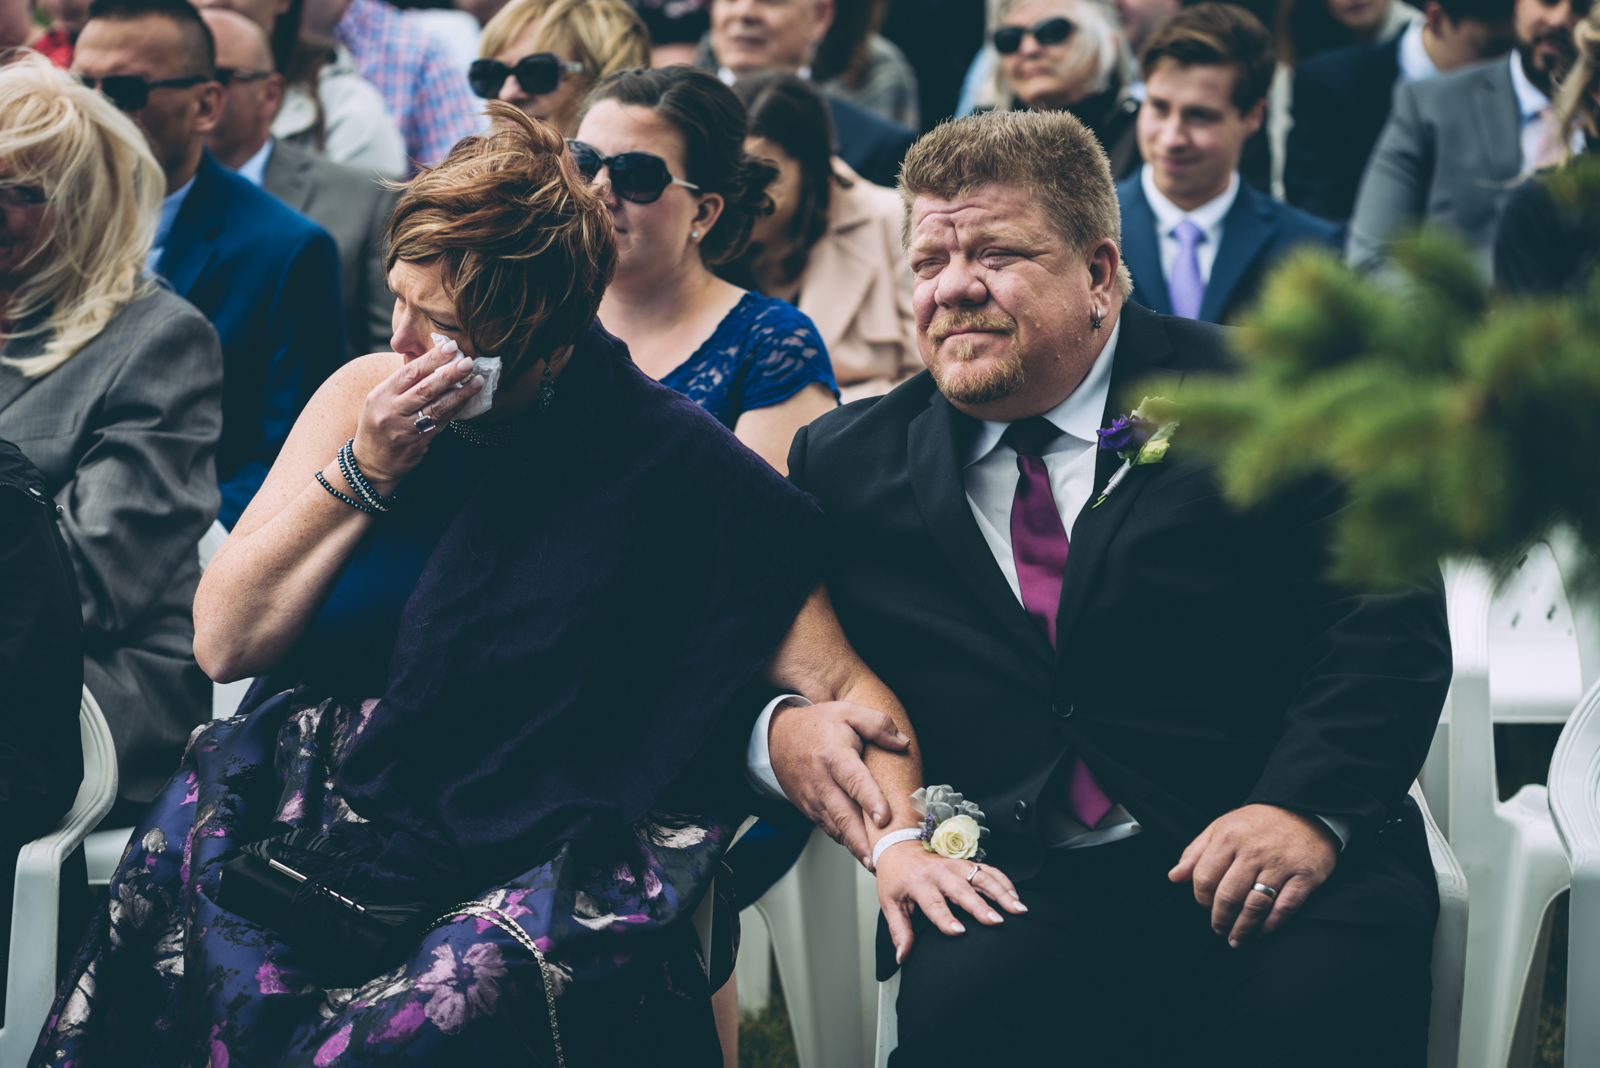 top-wedding-photos-2018-blog-3.jpg